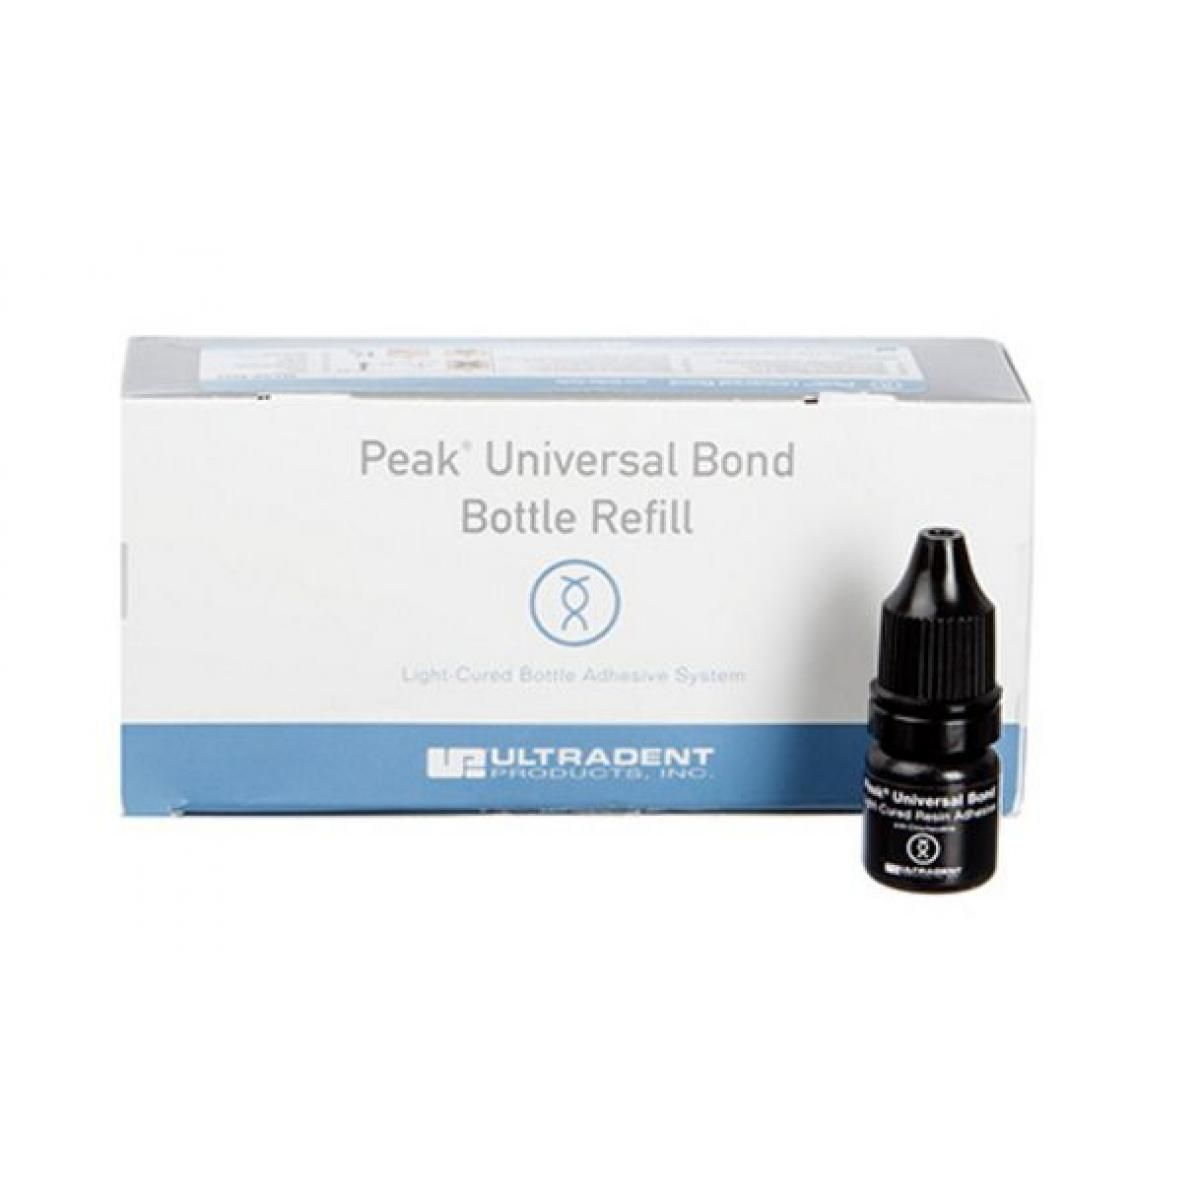 PEAK UNIVERSAL BOND 4ML ULTRADENT -